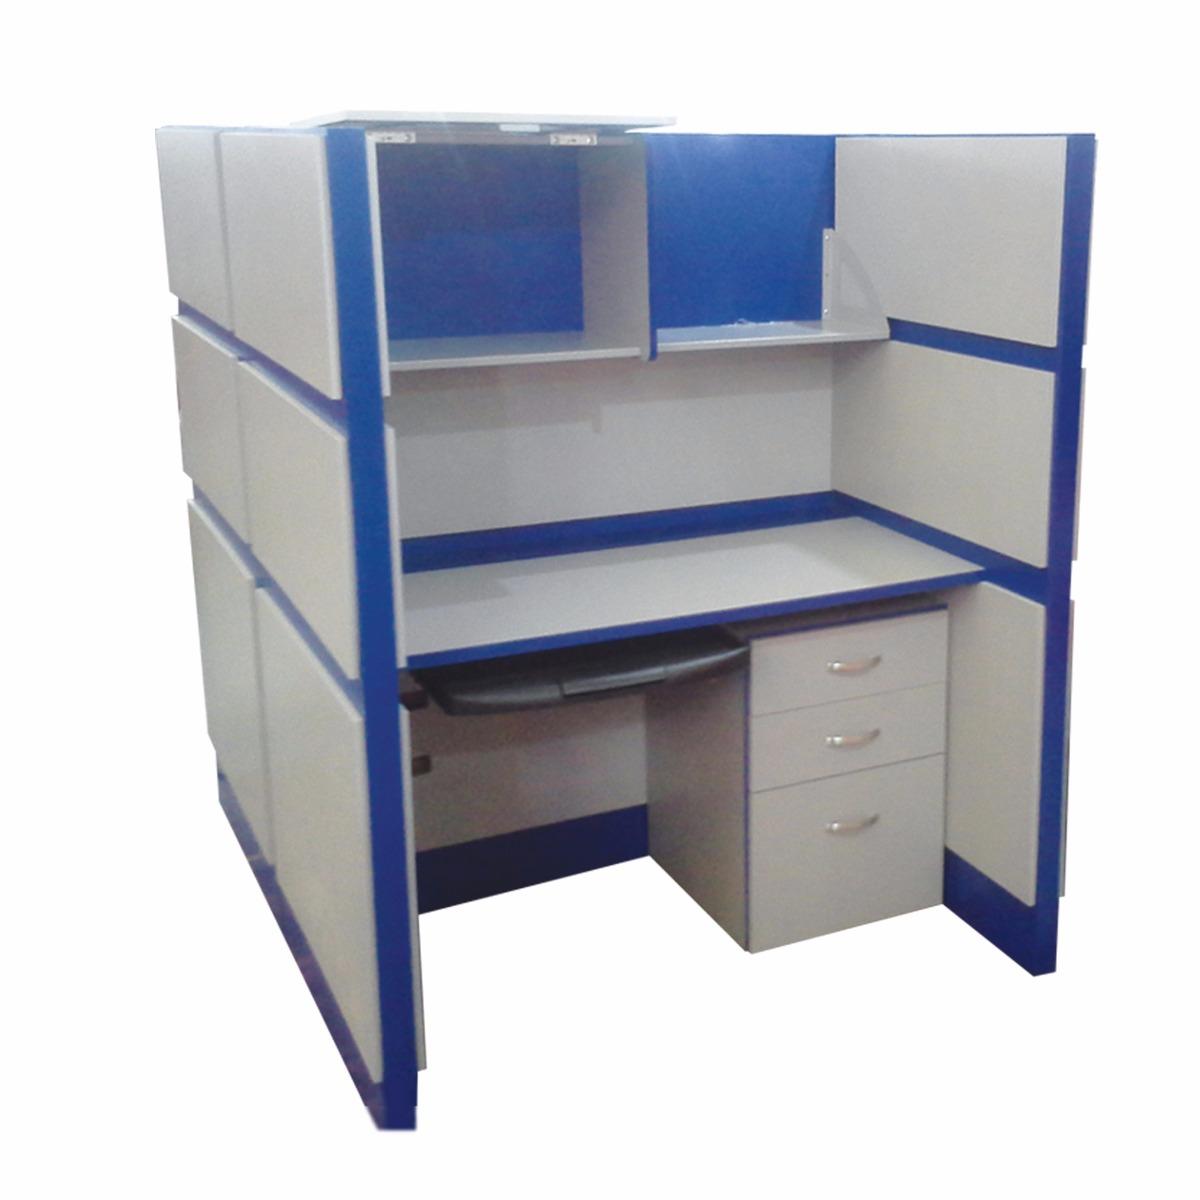 Muebles Modulares Para Oficinas En Mercado Libre # Muebles Modulares Para Oficina